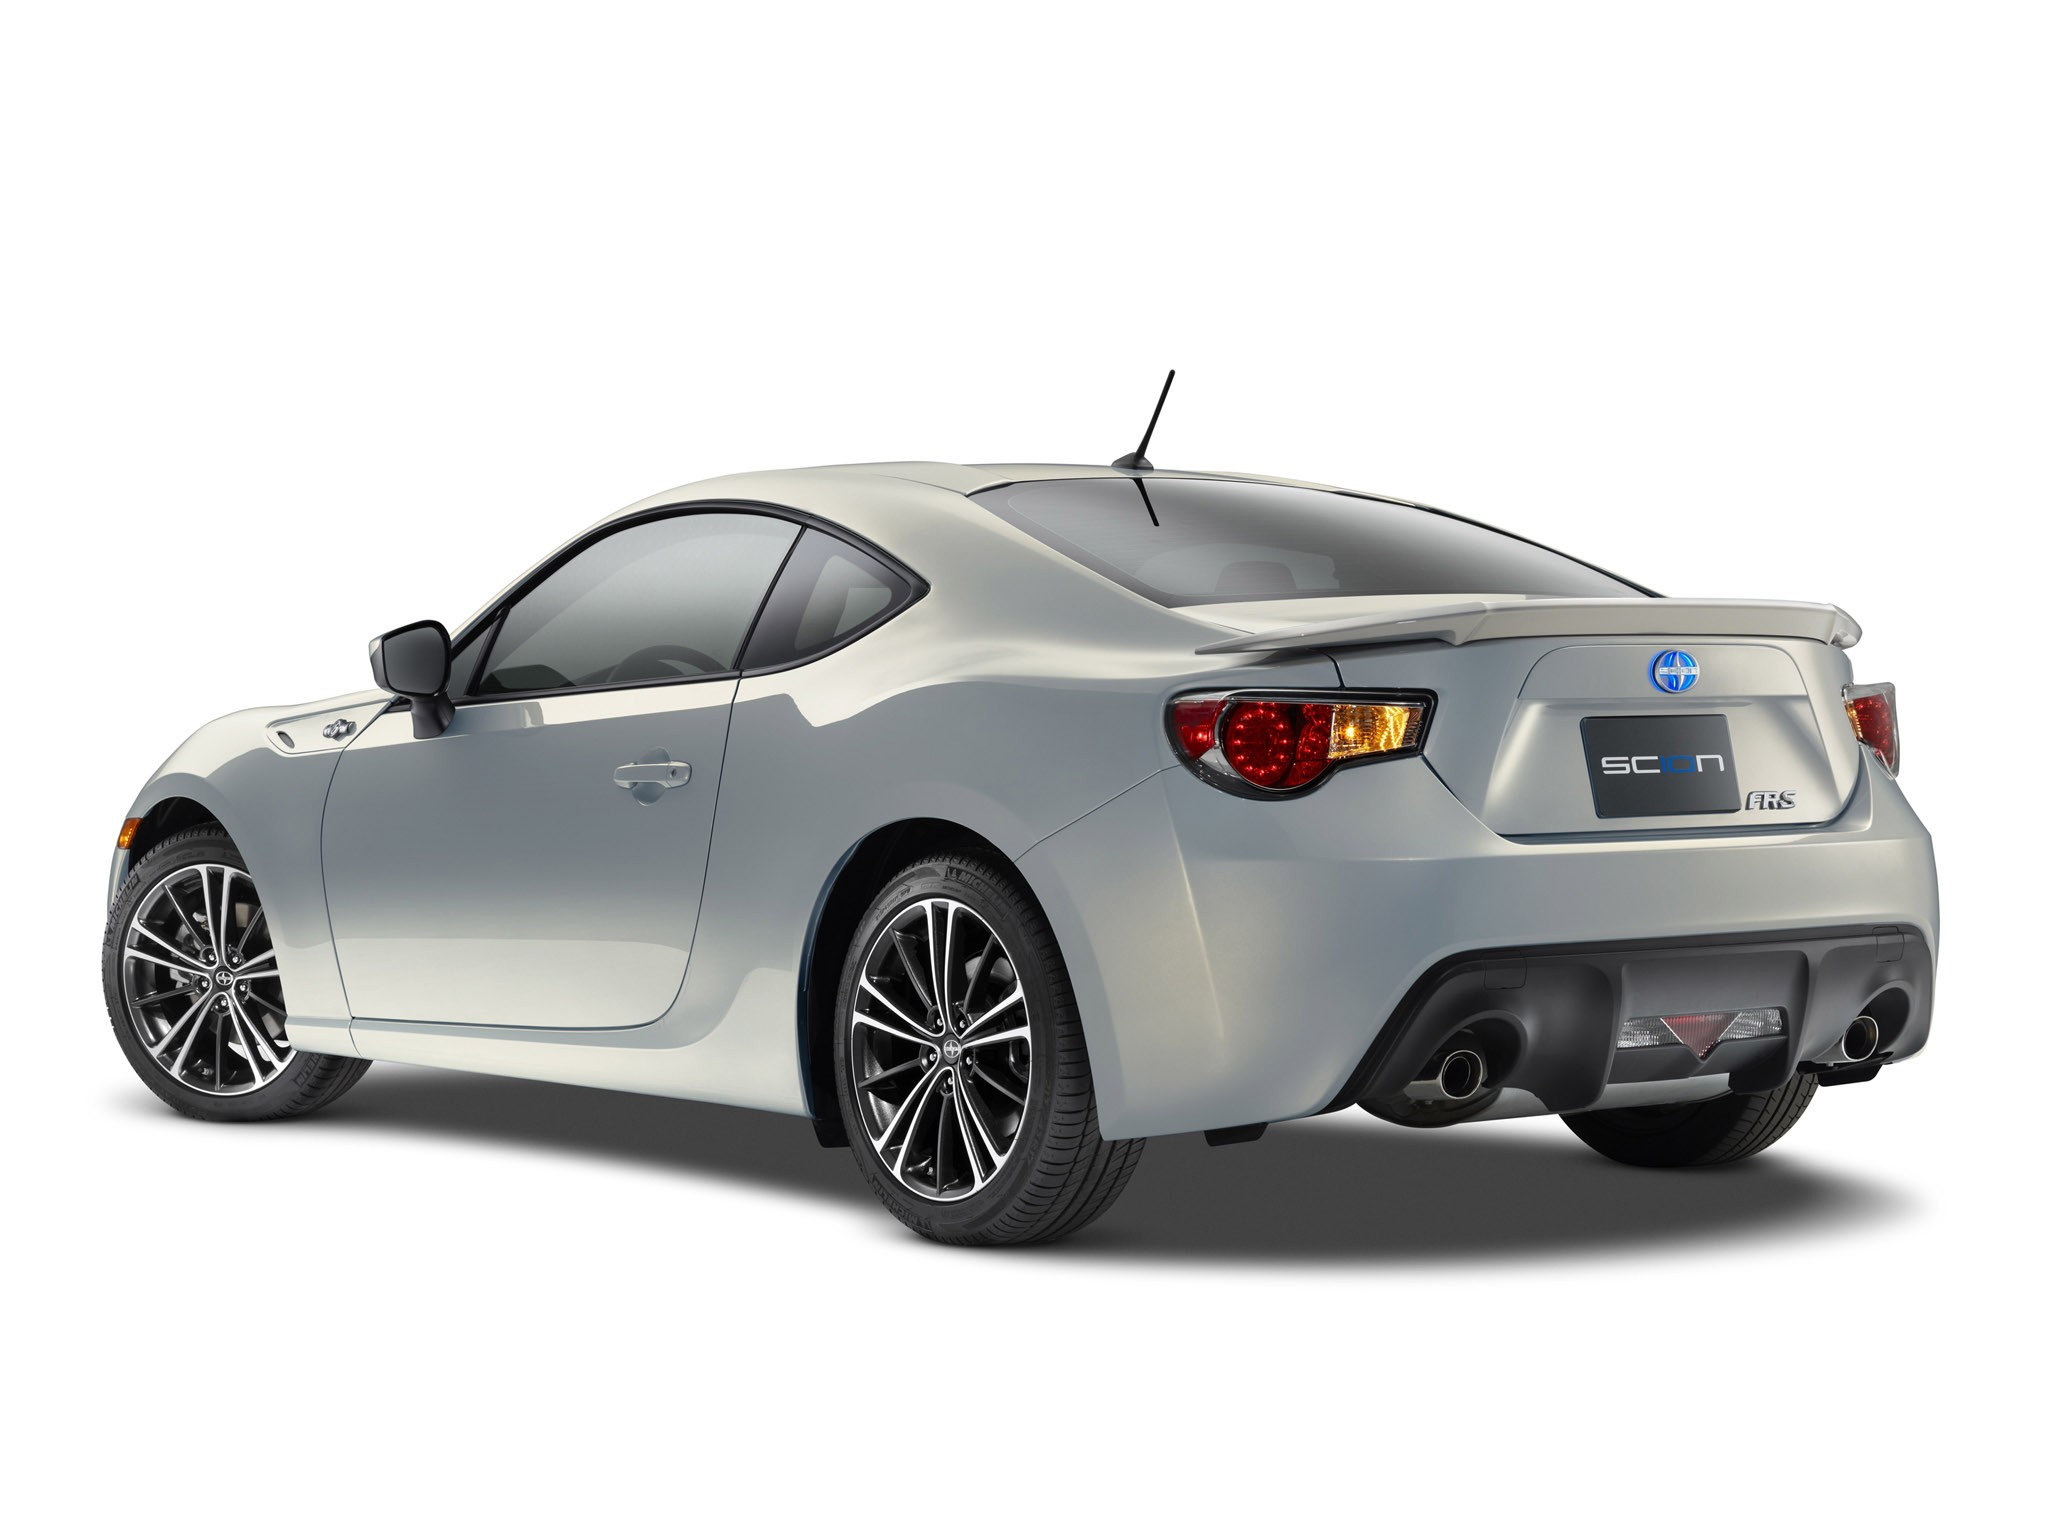 2013 Scion FR-S 10 Series